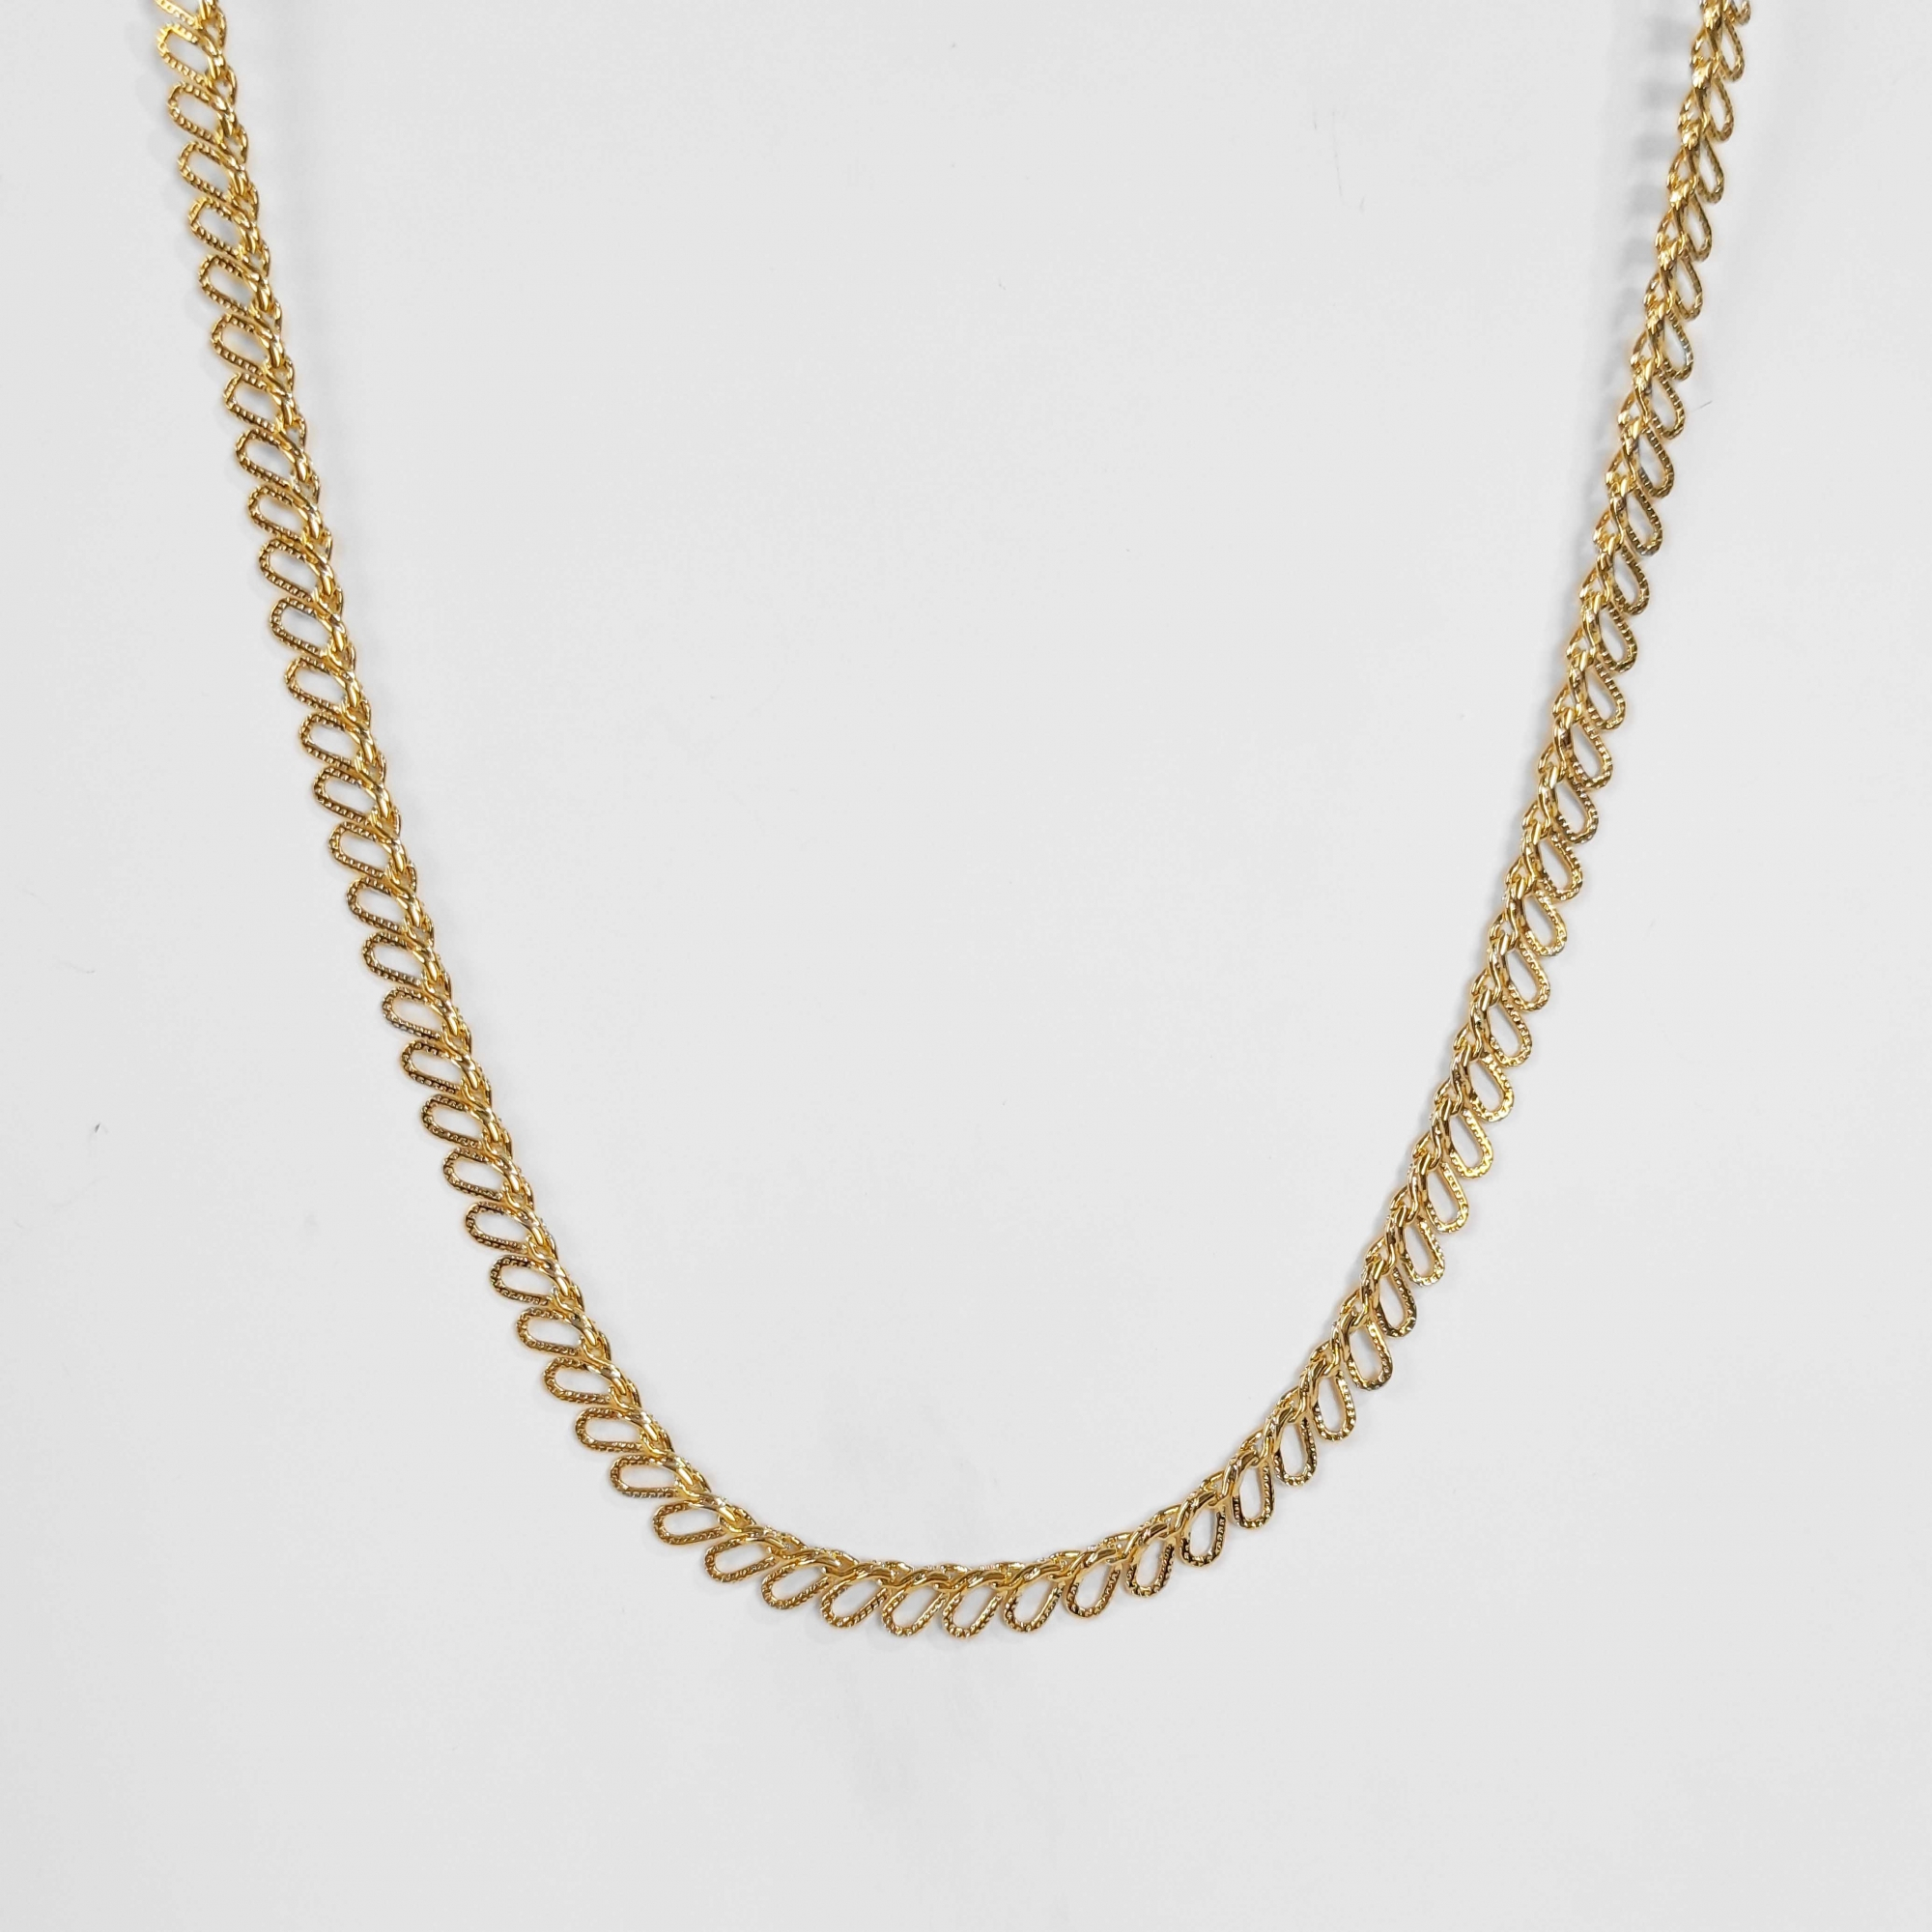 Colar Comprido Elo Entrelaçado Lateral 40cm Folheado Ouro 18k  - Lunozê Joias